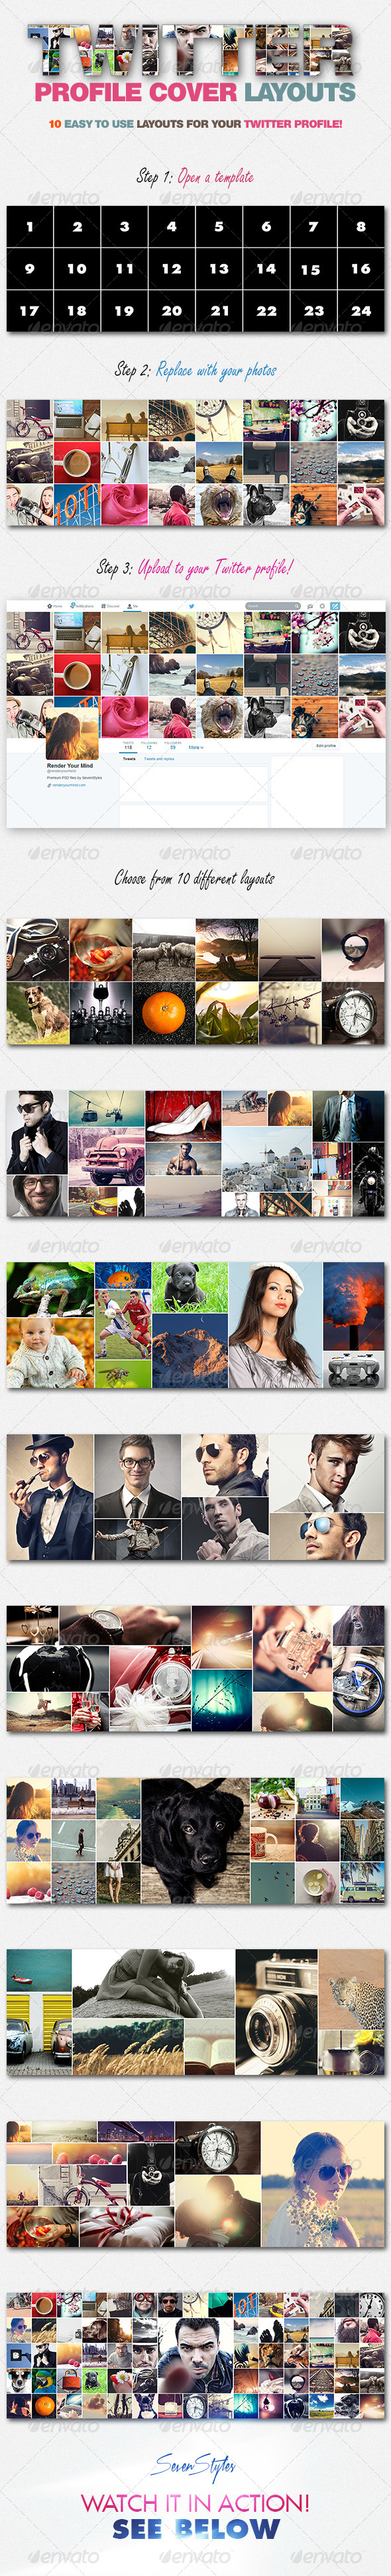 10 Twitter Profile Cover Templates - Twitter Social Media